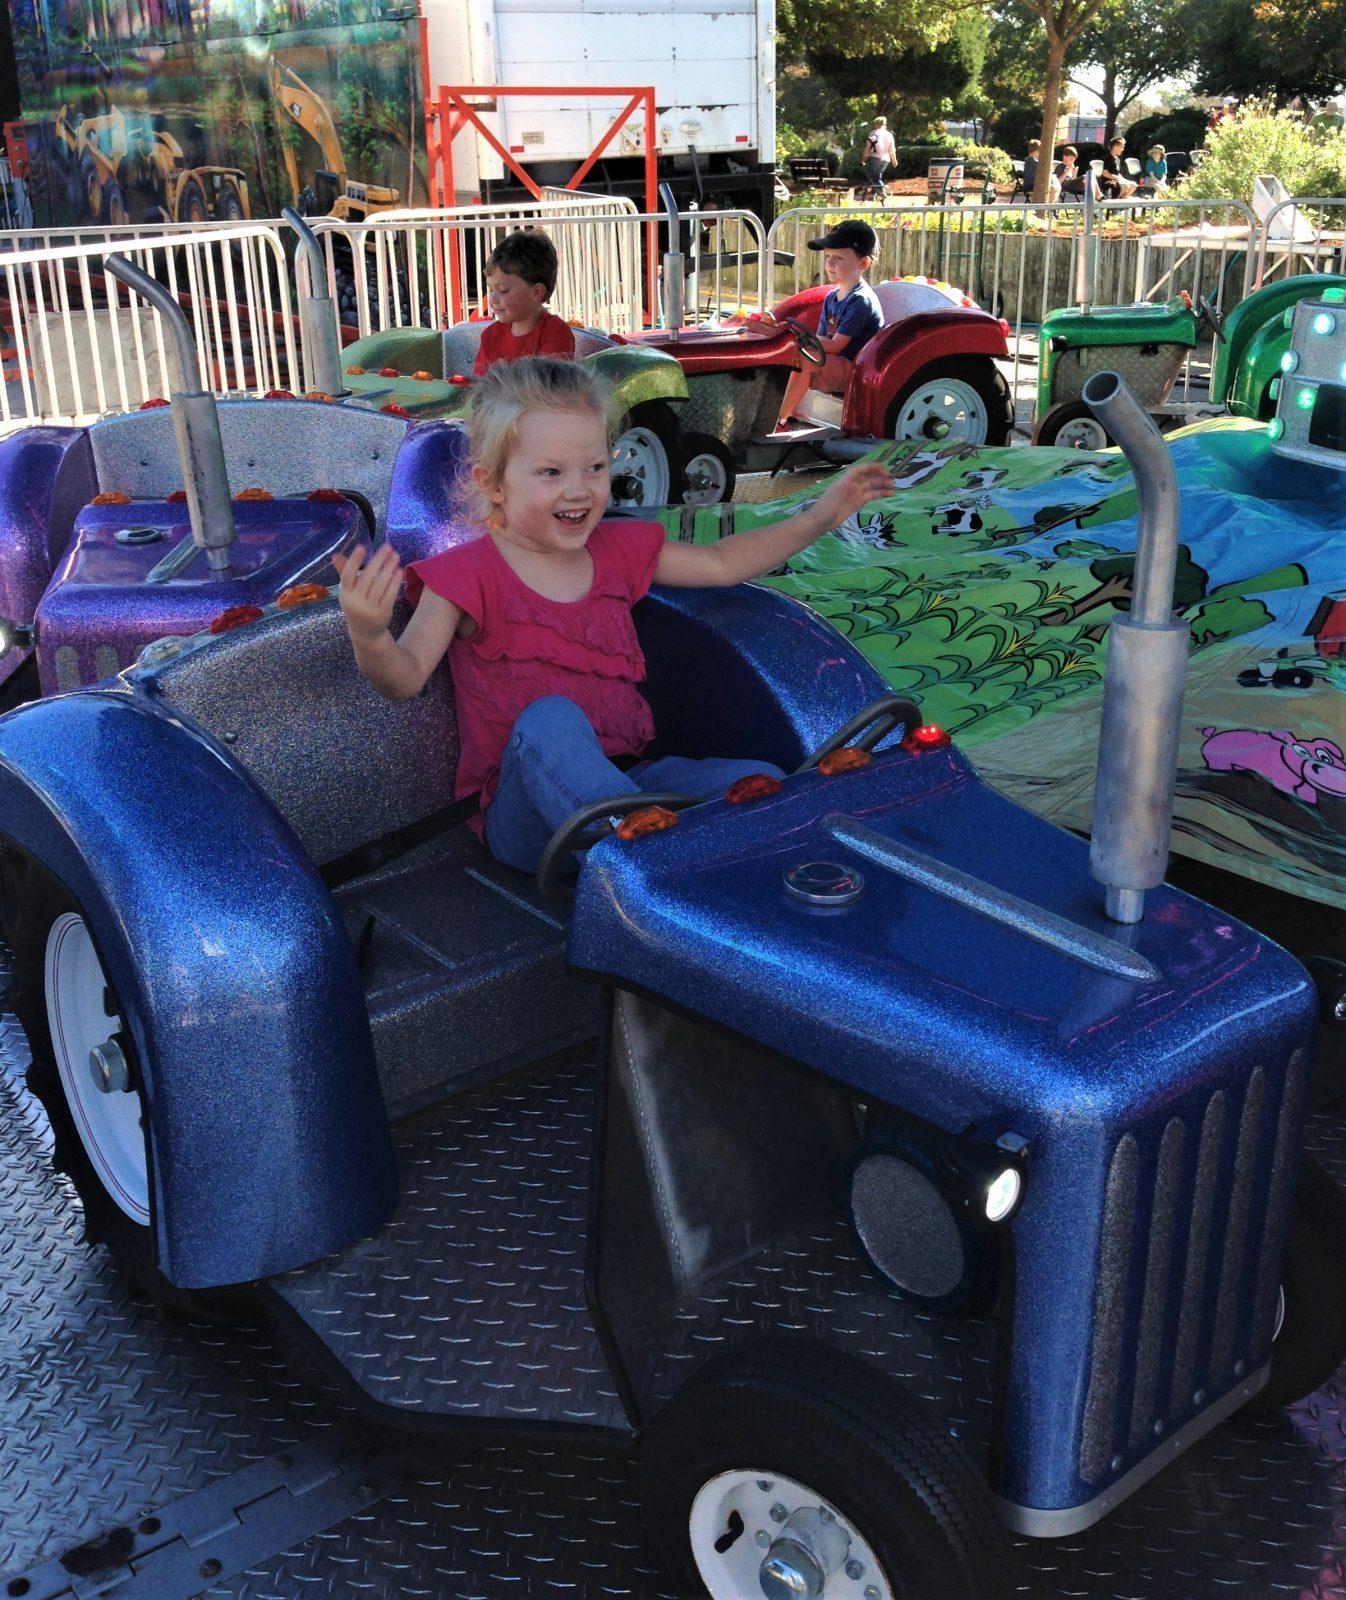 tractor fair ride